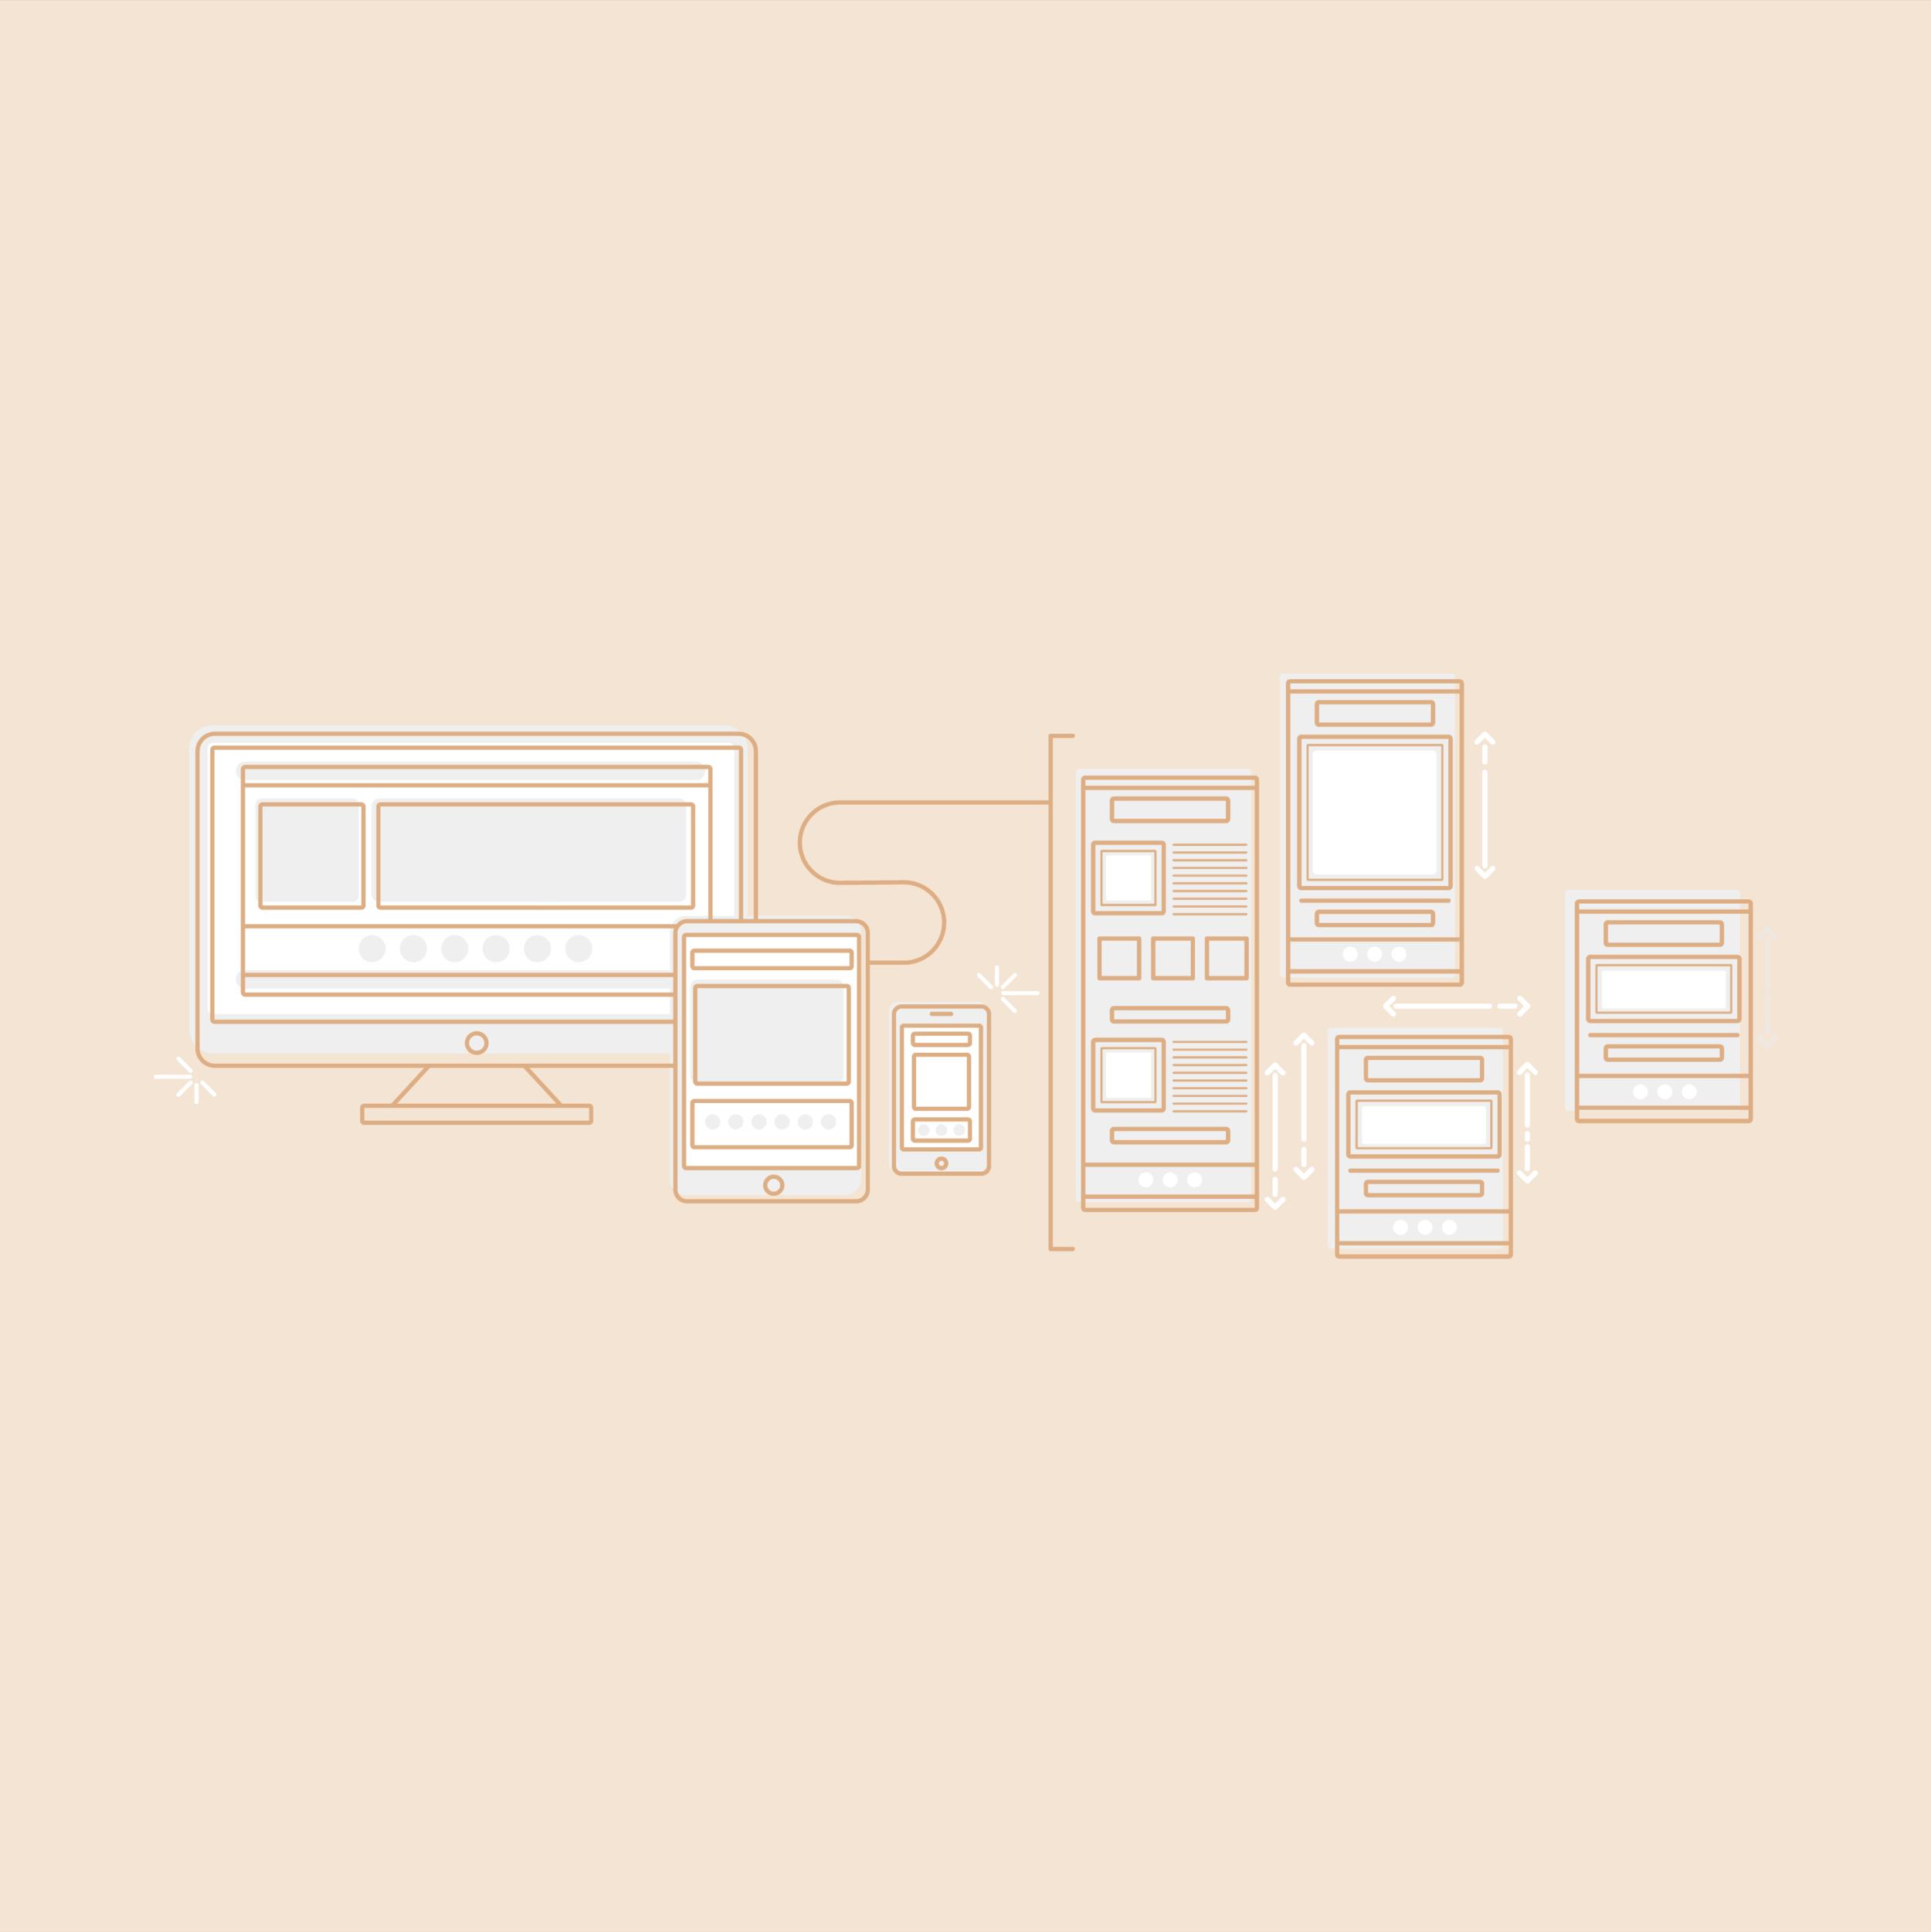 MKW_Web Design WTE-05.png